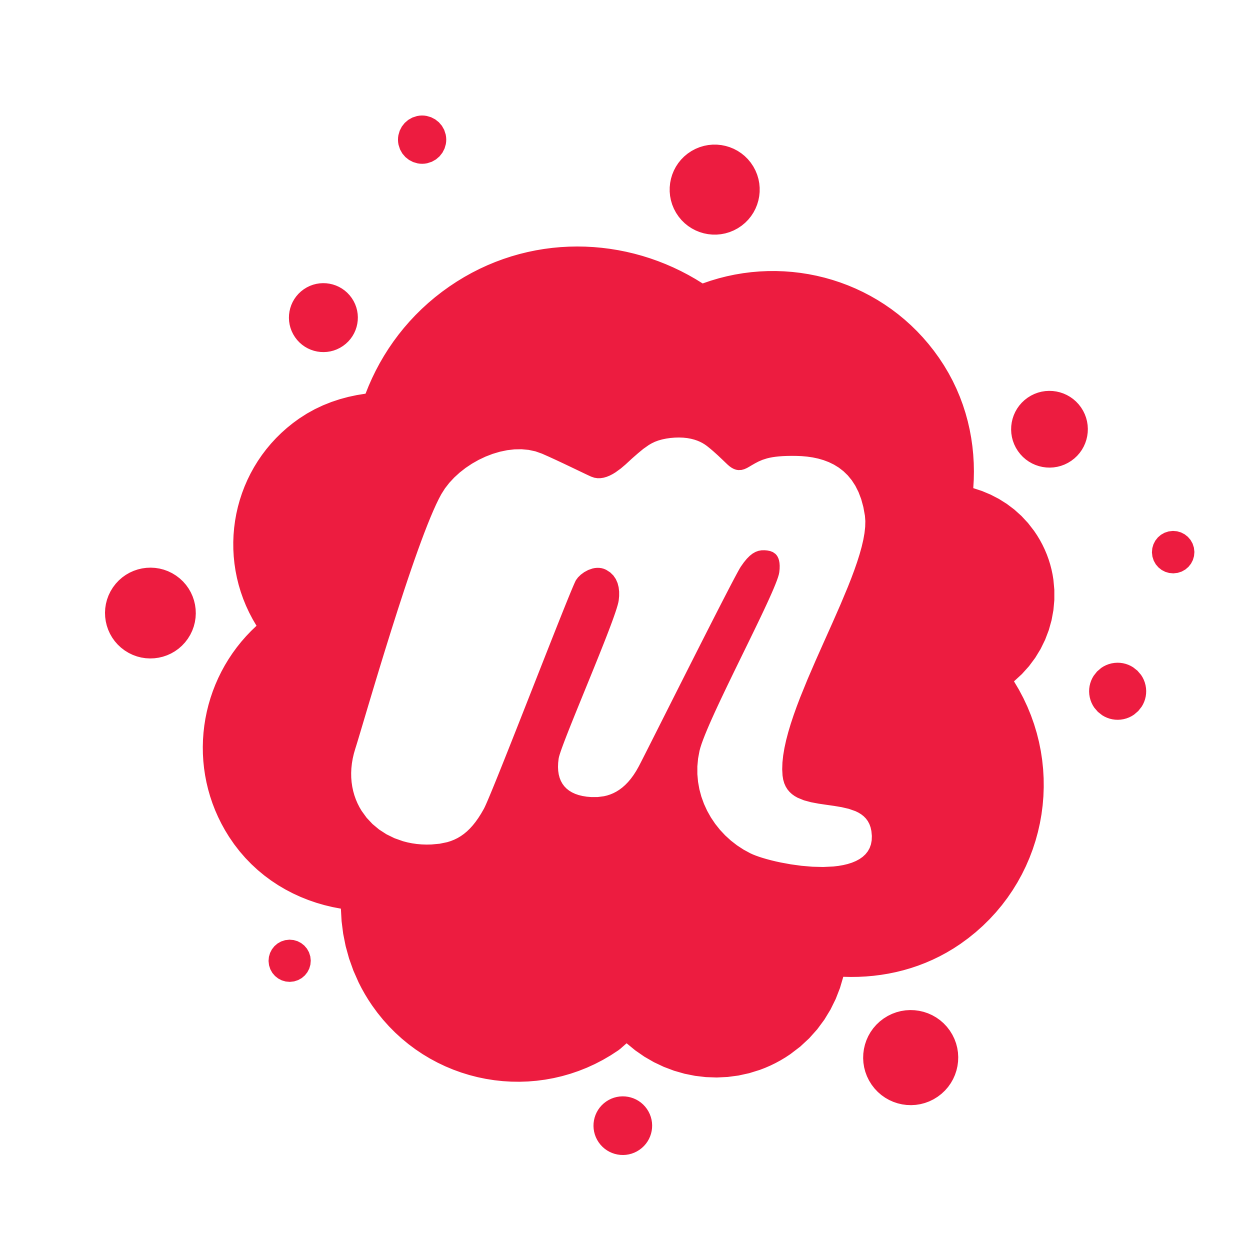 Meetup - Meetup Vector PNG